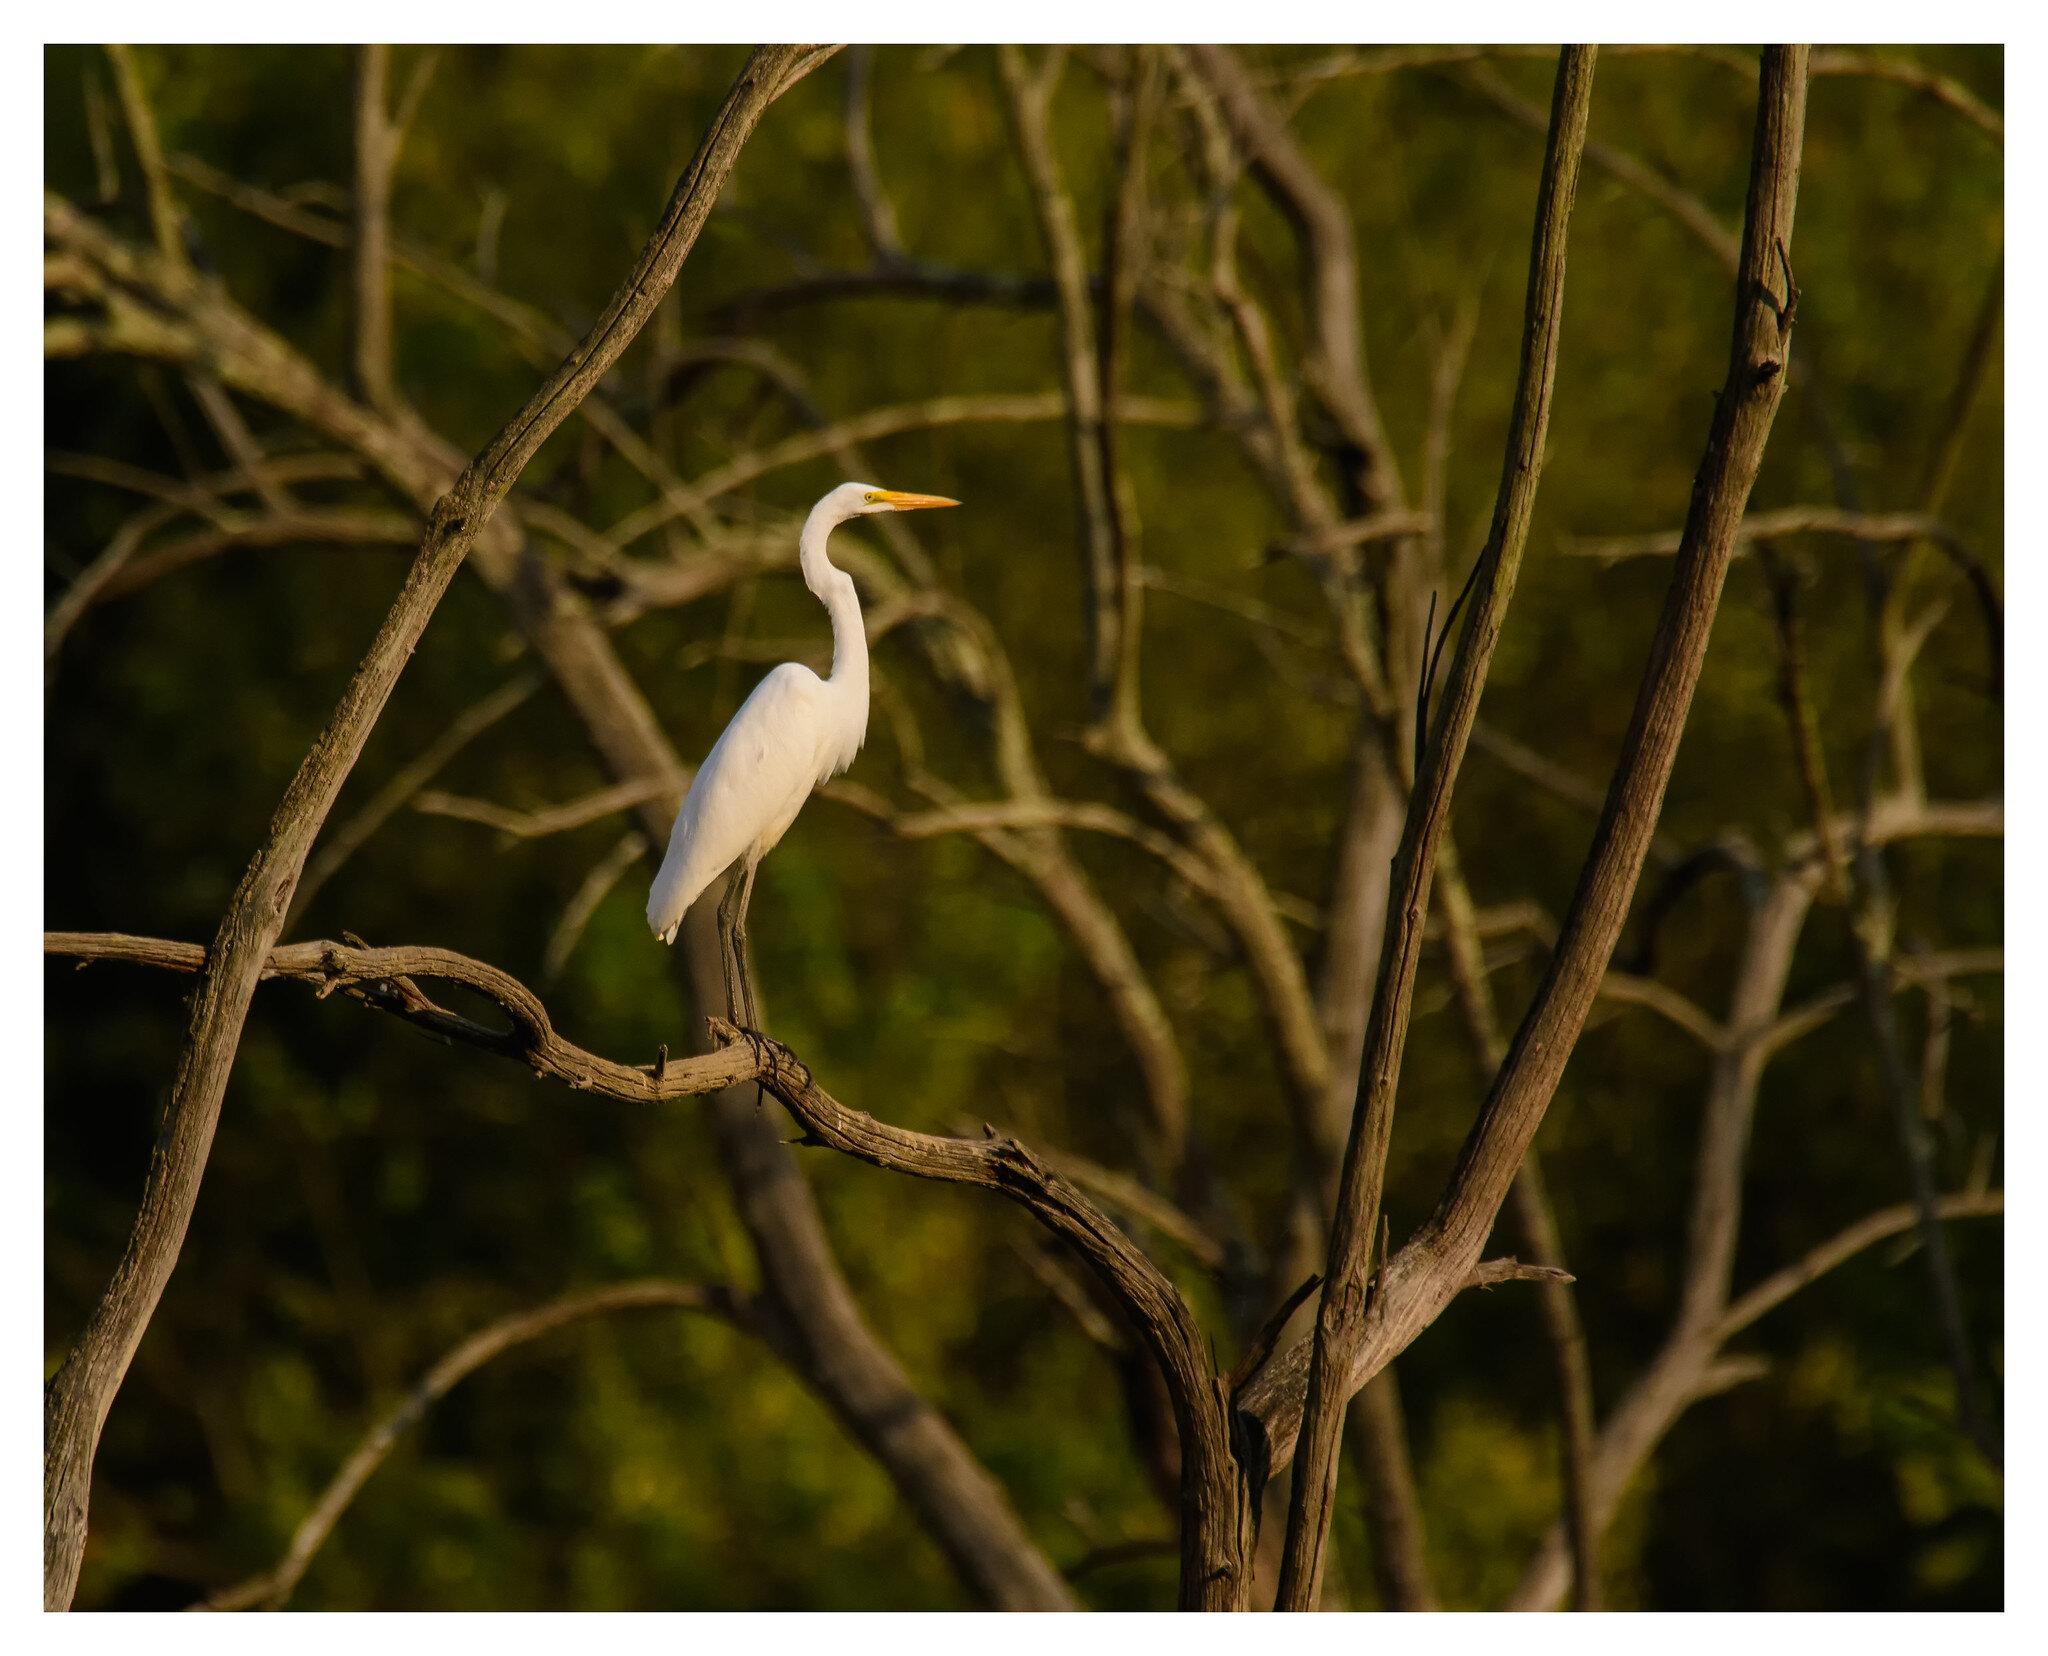 Great White Egret - Caesar Creek State Park